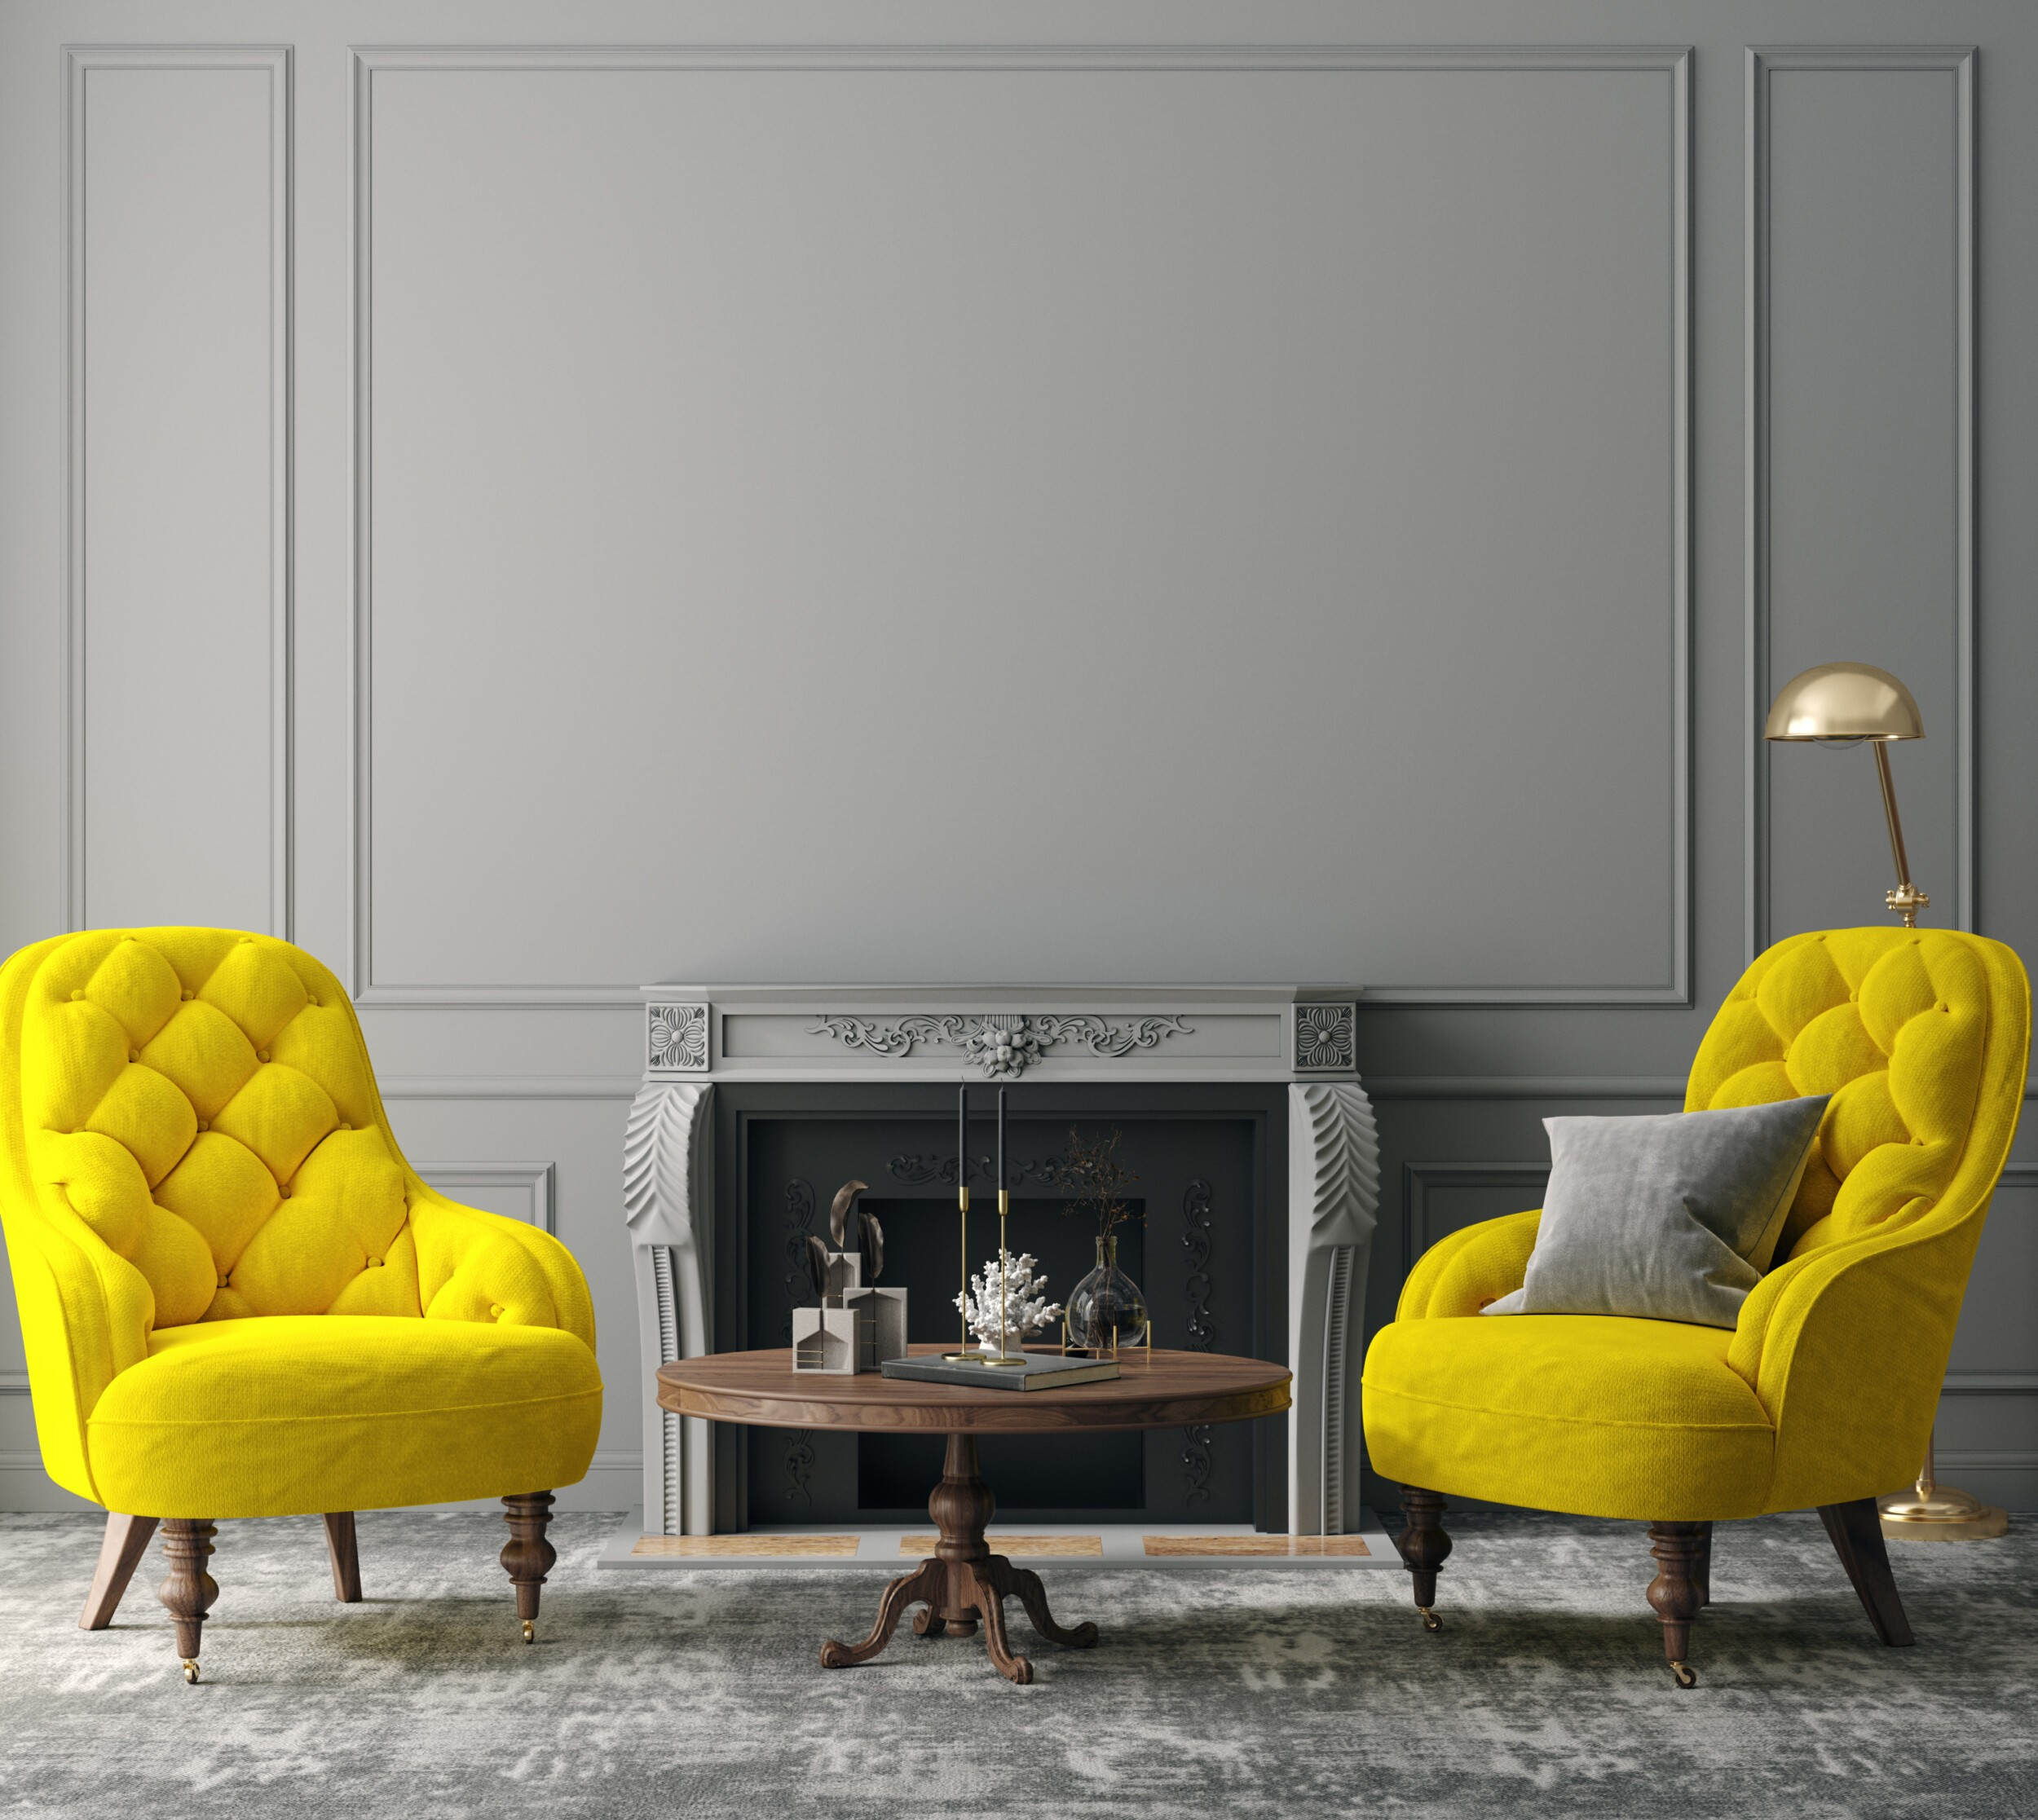 Elegant dark grey interior with bright yellow armchairs